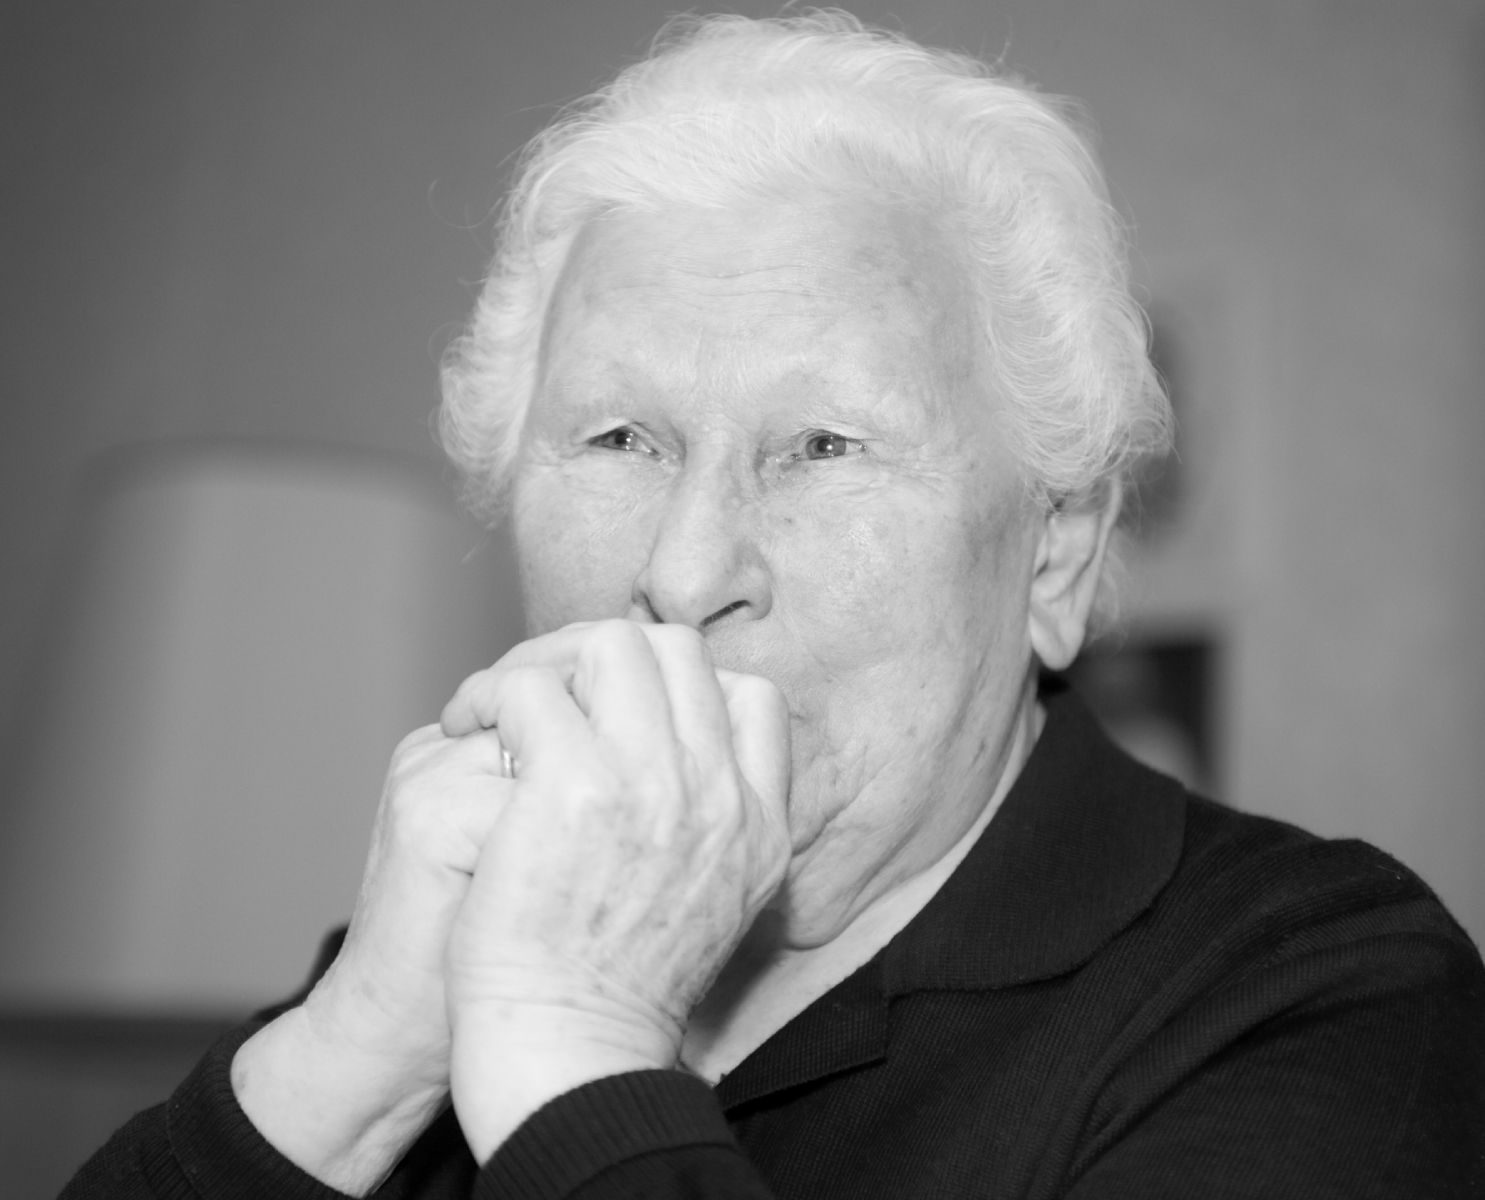 Luzia Kollak